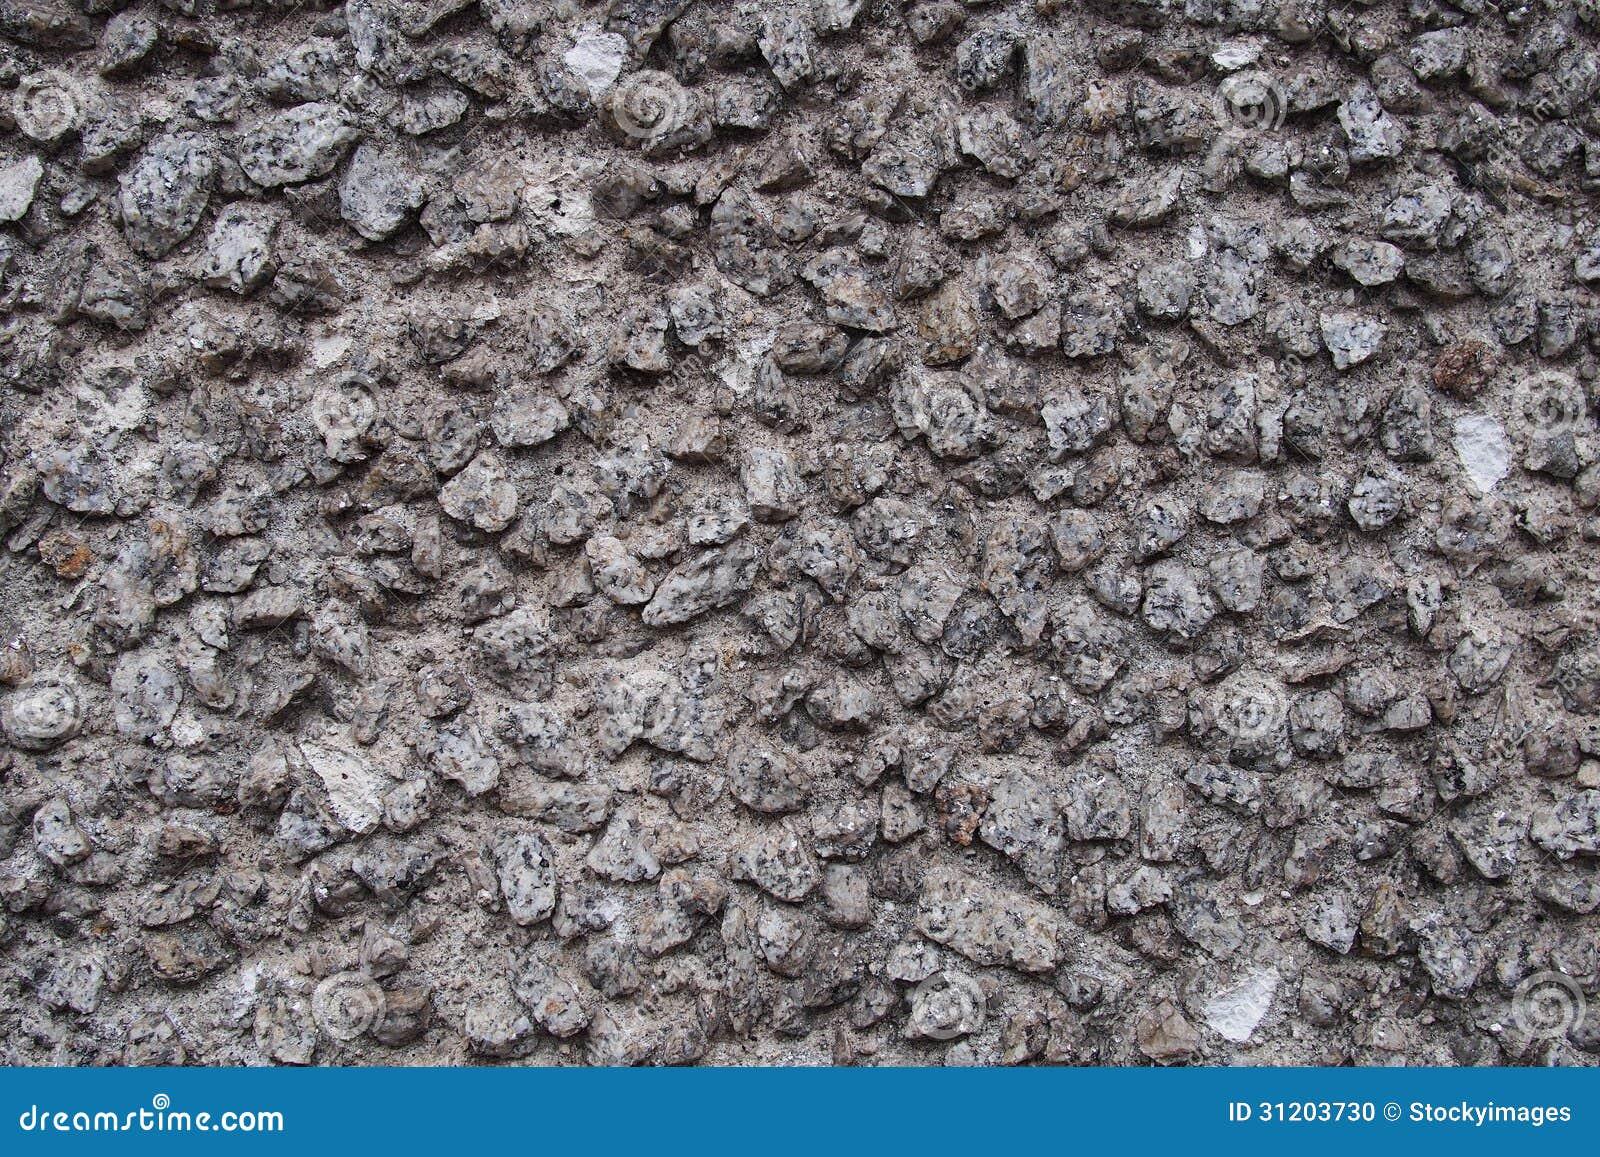 Rough Texture Background: Concrete, Rough Surface Background Stock Photo